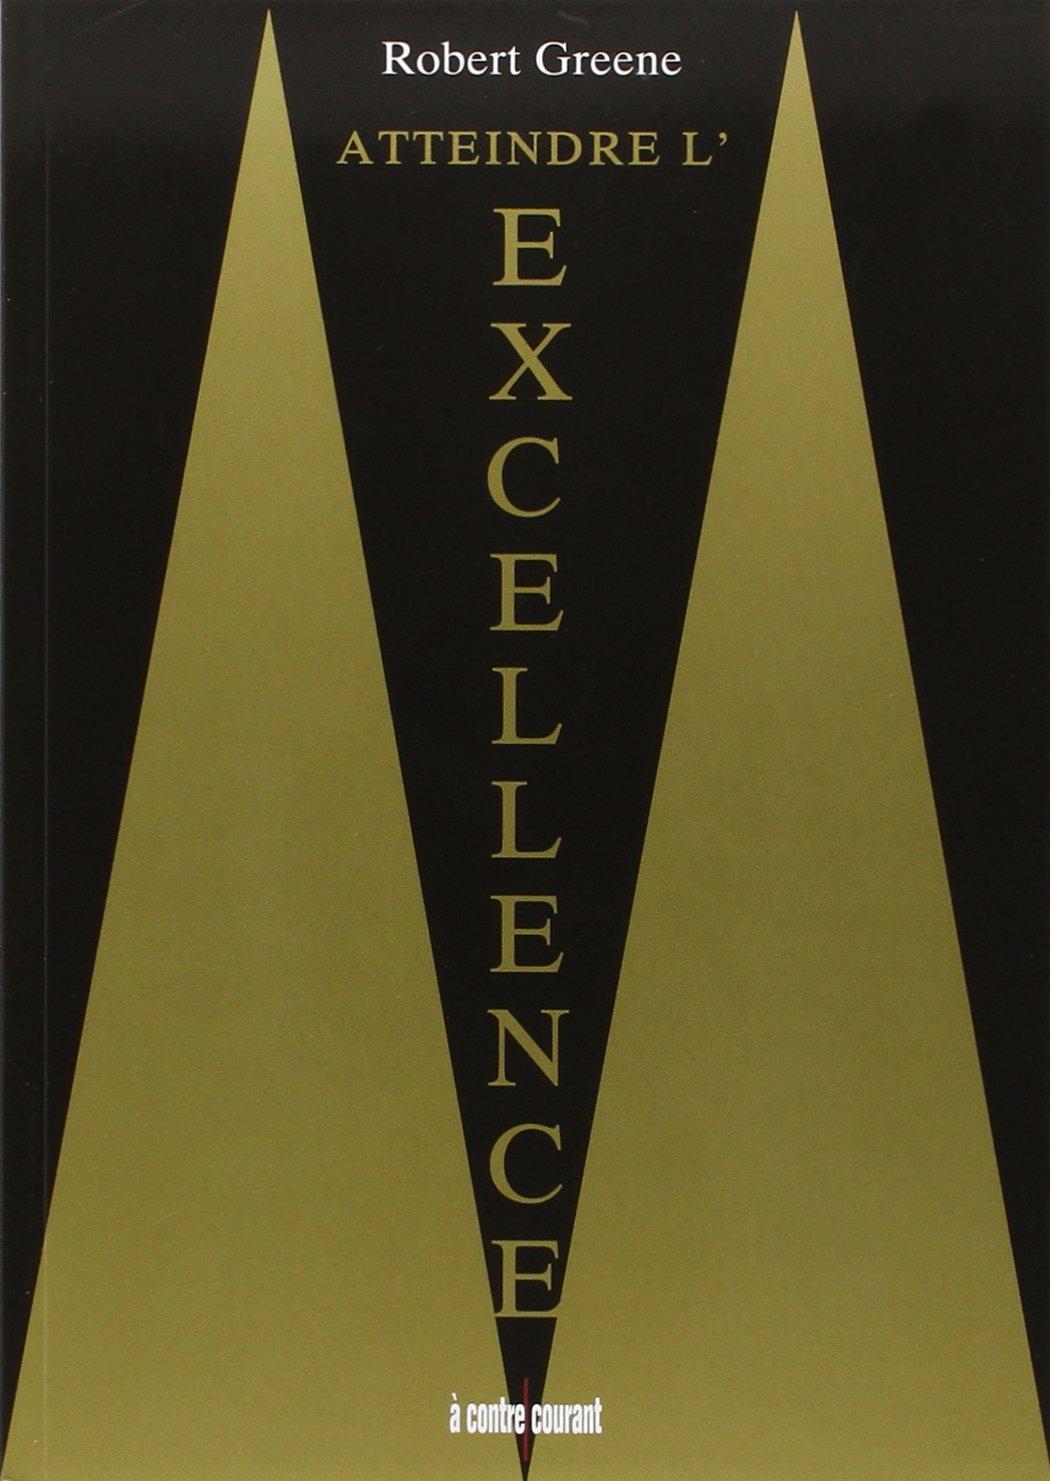 Atteindre l'excellence Broché – 21 mars 2014 Robert Greene Atteindre l'excellence Editions Leduc B00FLJFBYU